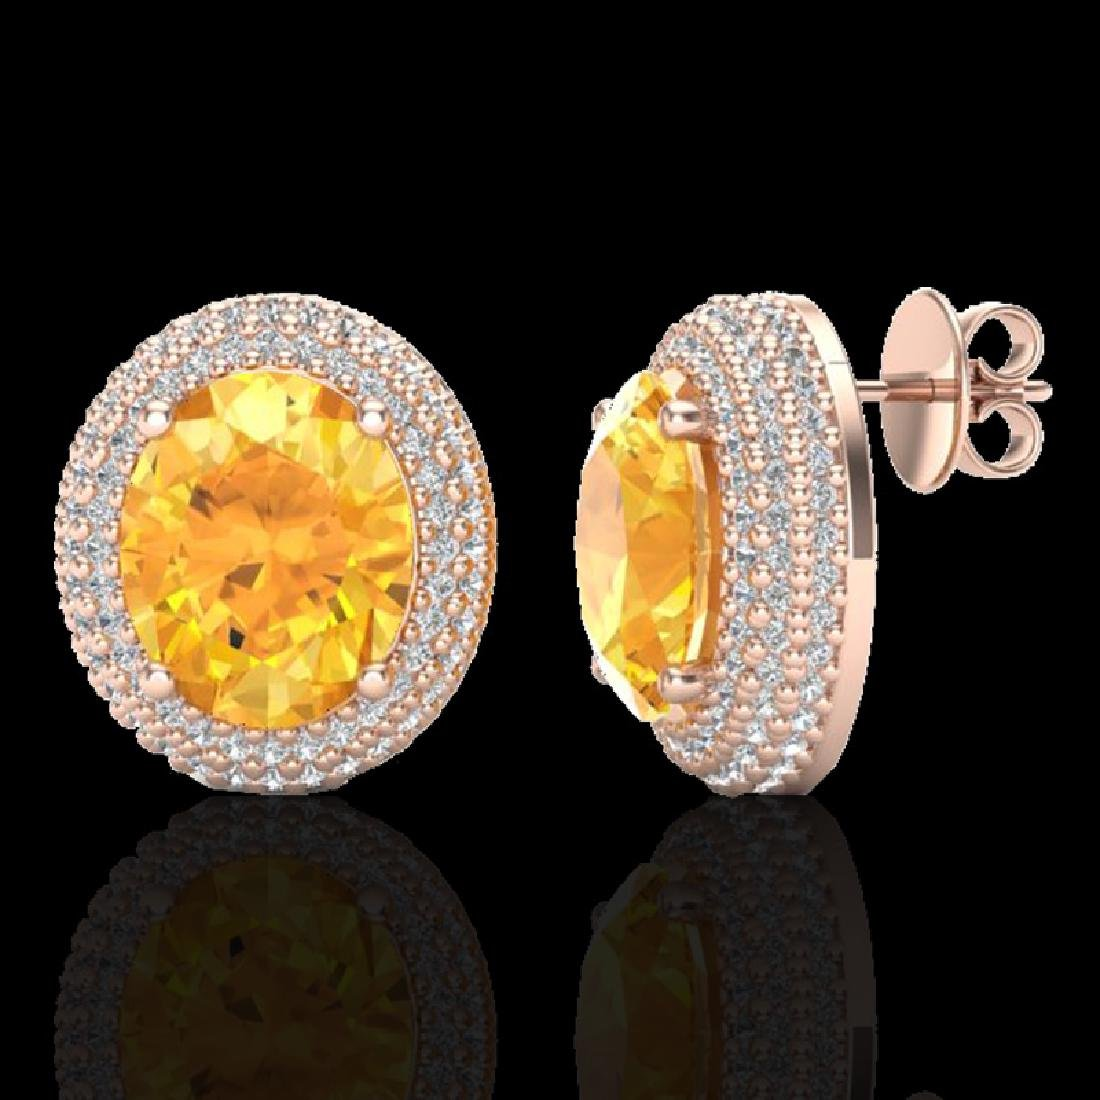 8 CTW Citrine & Micro Pave VS/SI Diamond Earrings 14K - 2